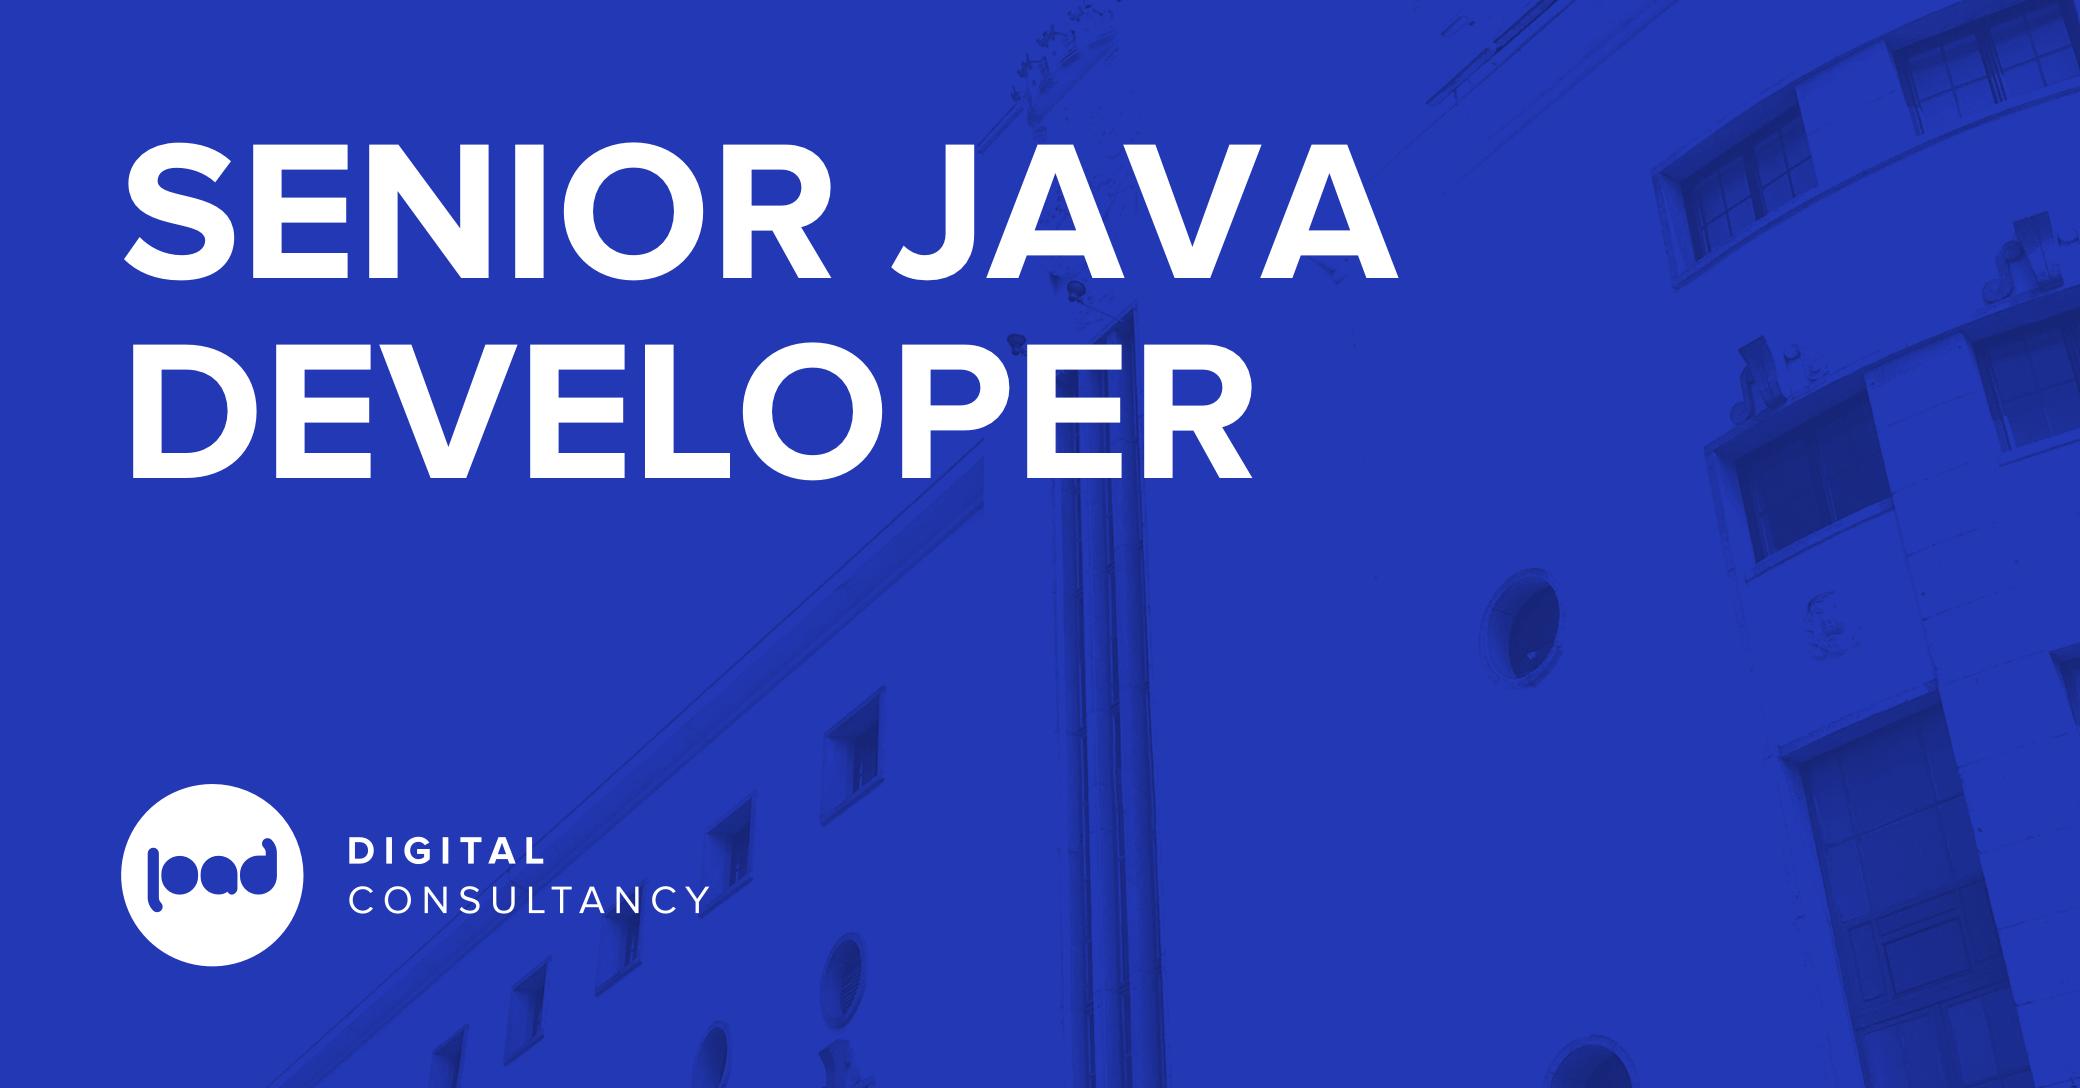 Senior Java Developer@2x.png